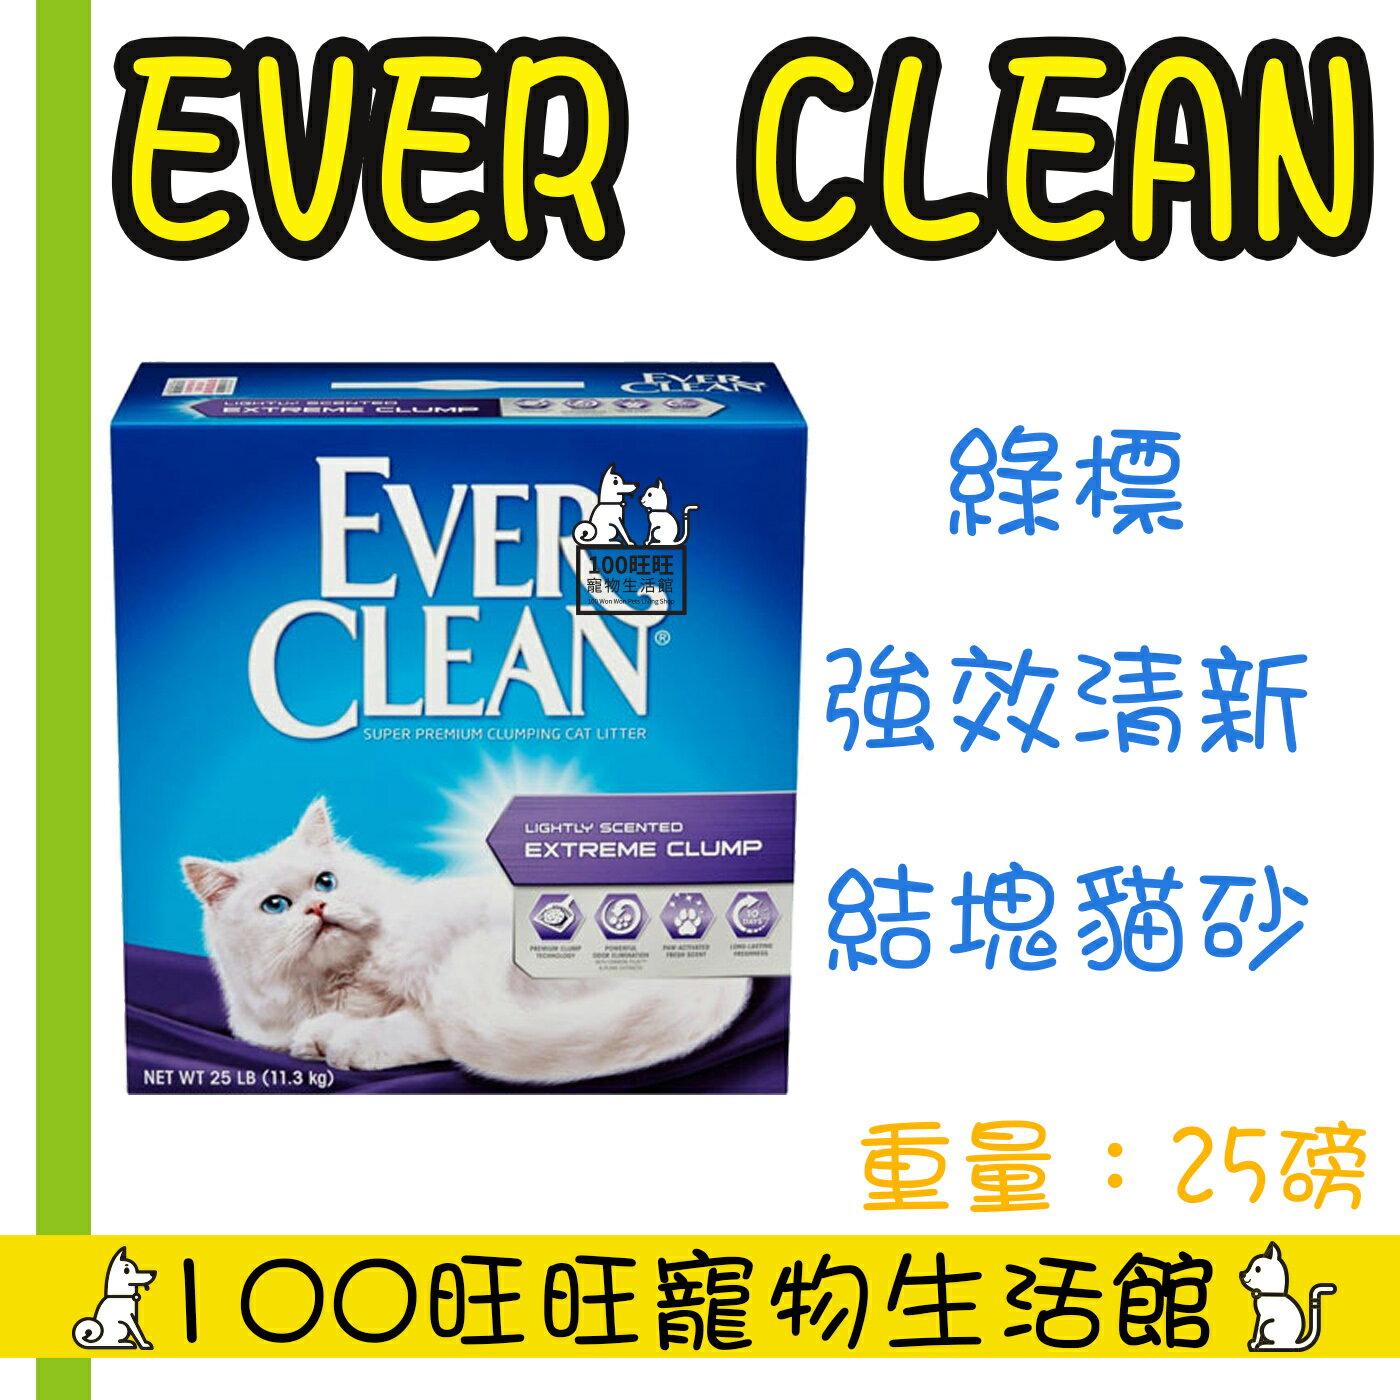 Ever Clean 藍鑽貓砂 綠標 強效清香 活性碳除臭配方 超凝結清香貓砂 25磅 盒裝 11.3KG 25lb